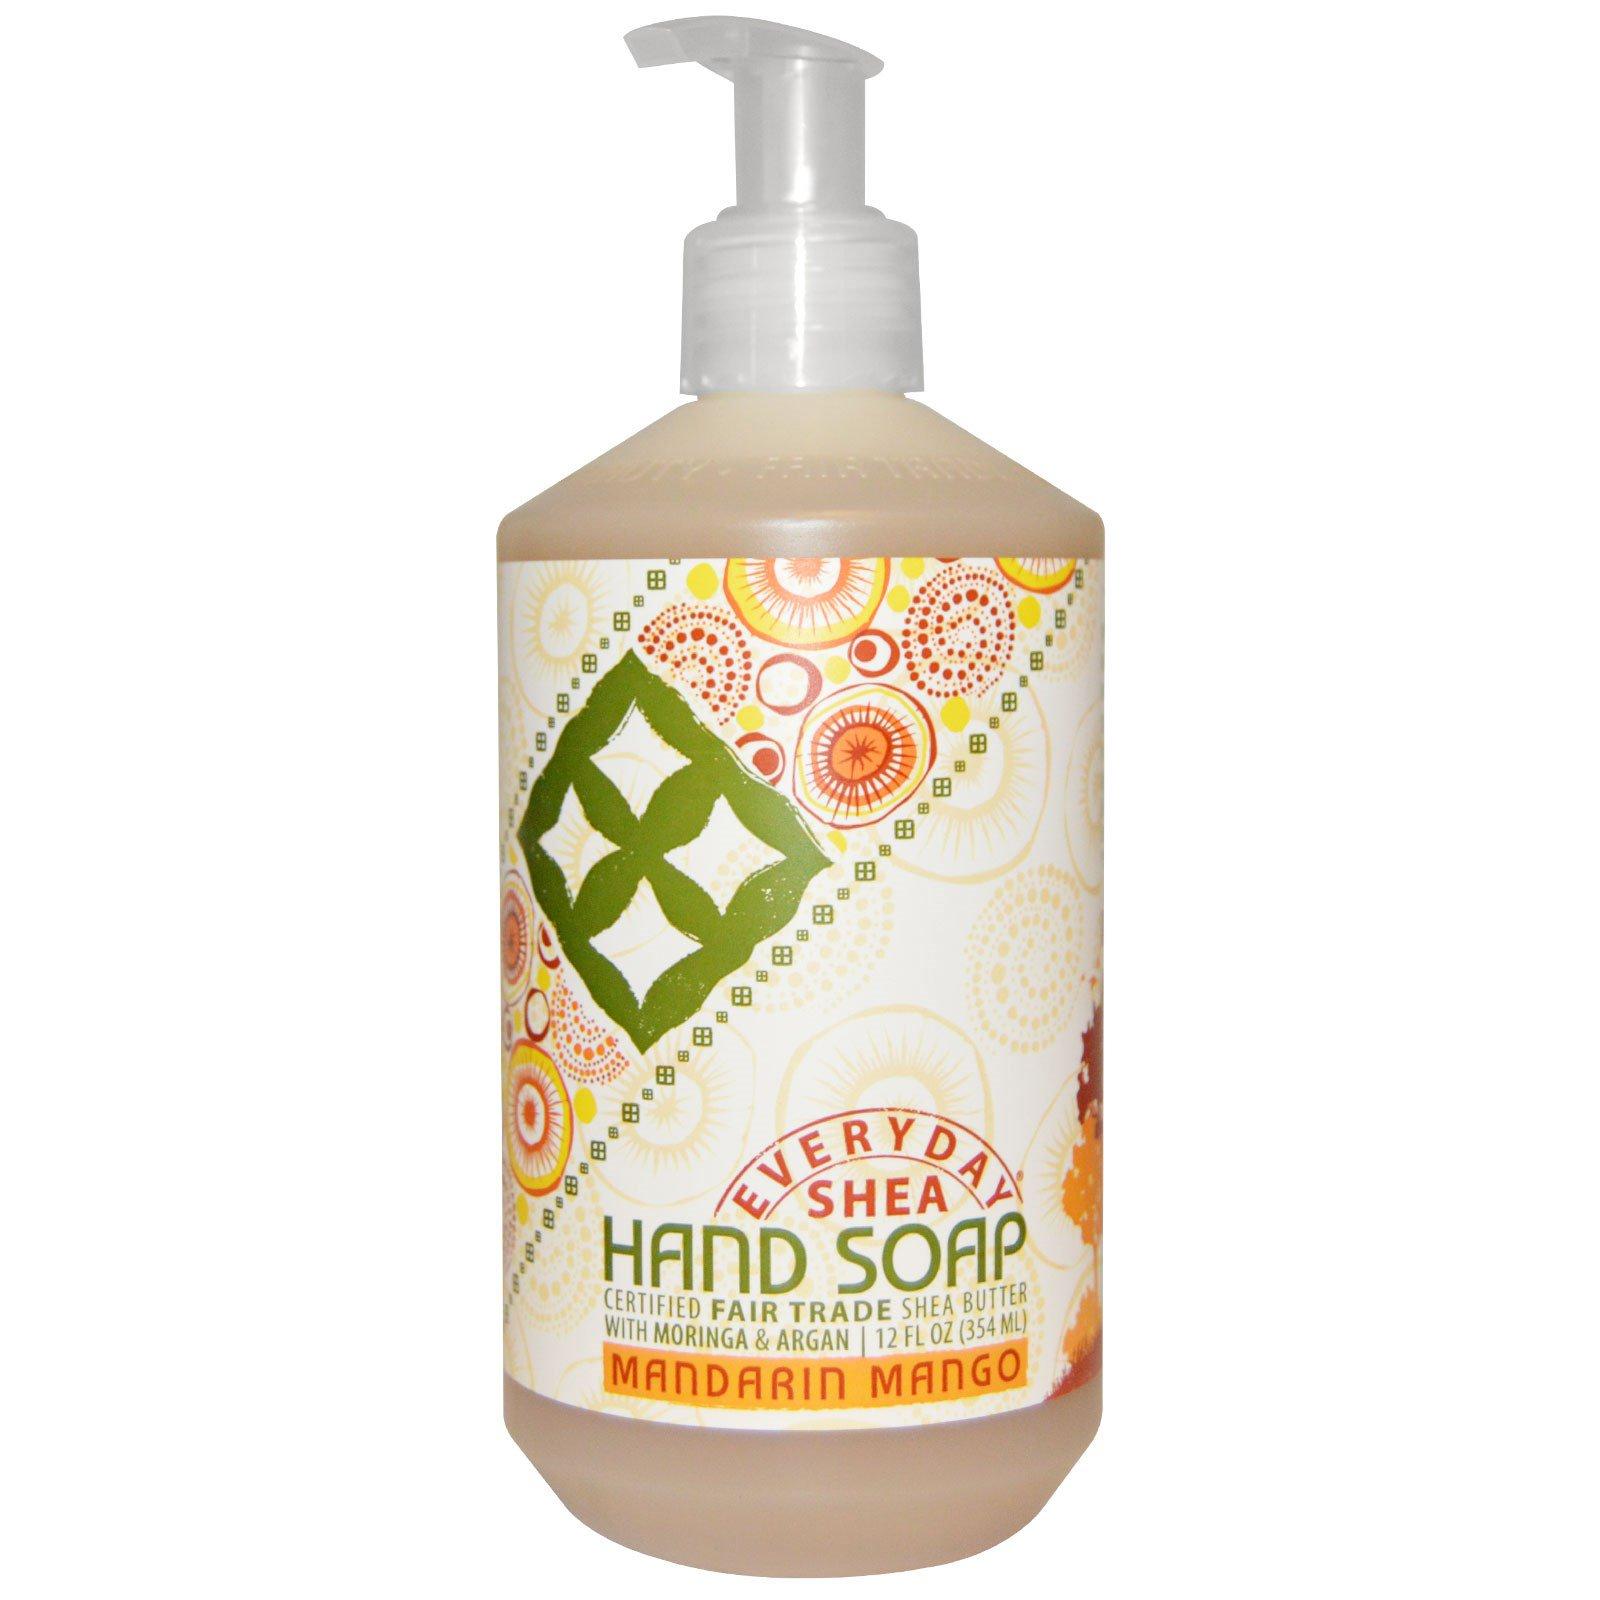 Everyday Shea, Everyday Shea, Hand Soap, Mandarin Mango, 12 fl oz (354 ml)